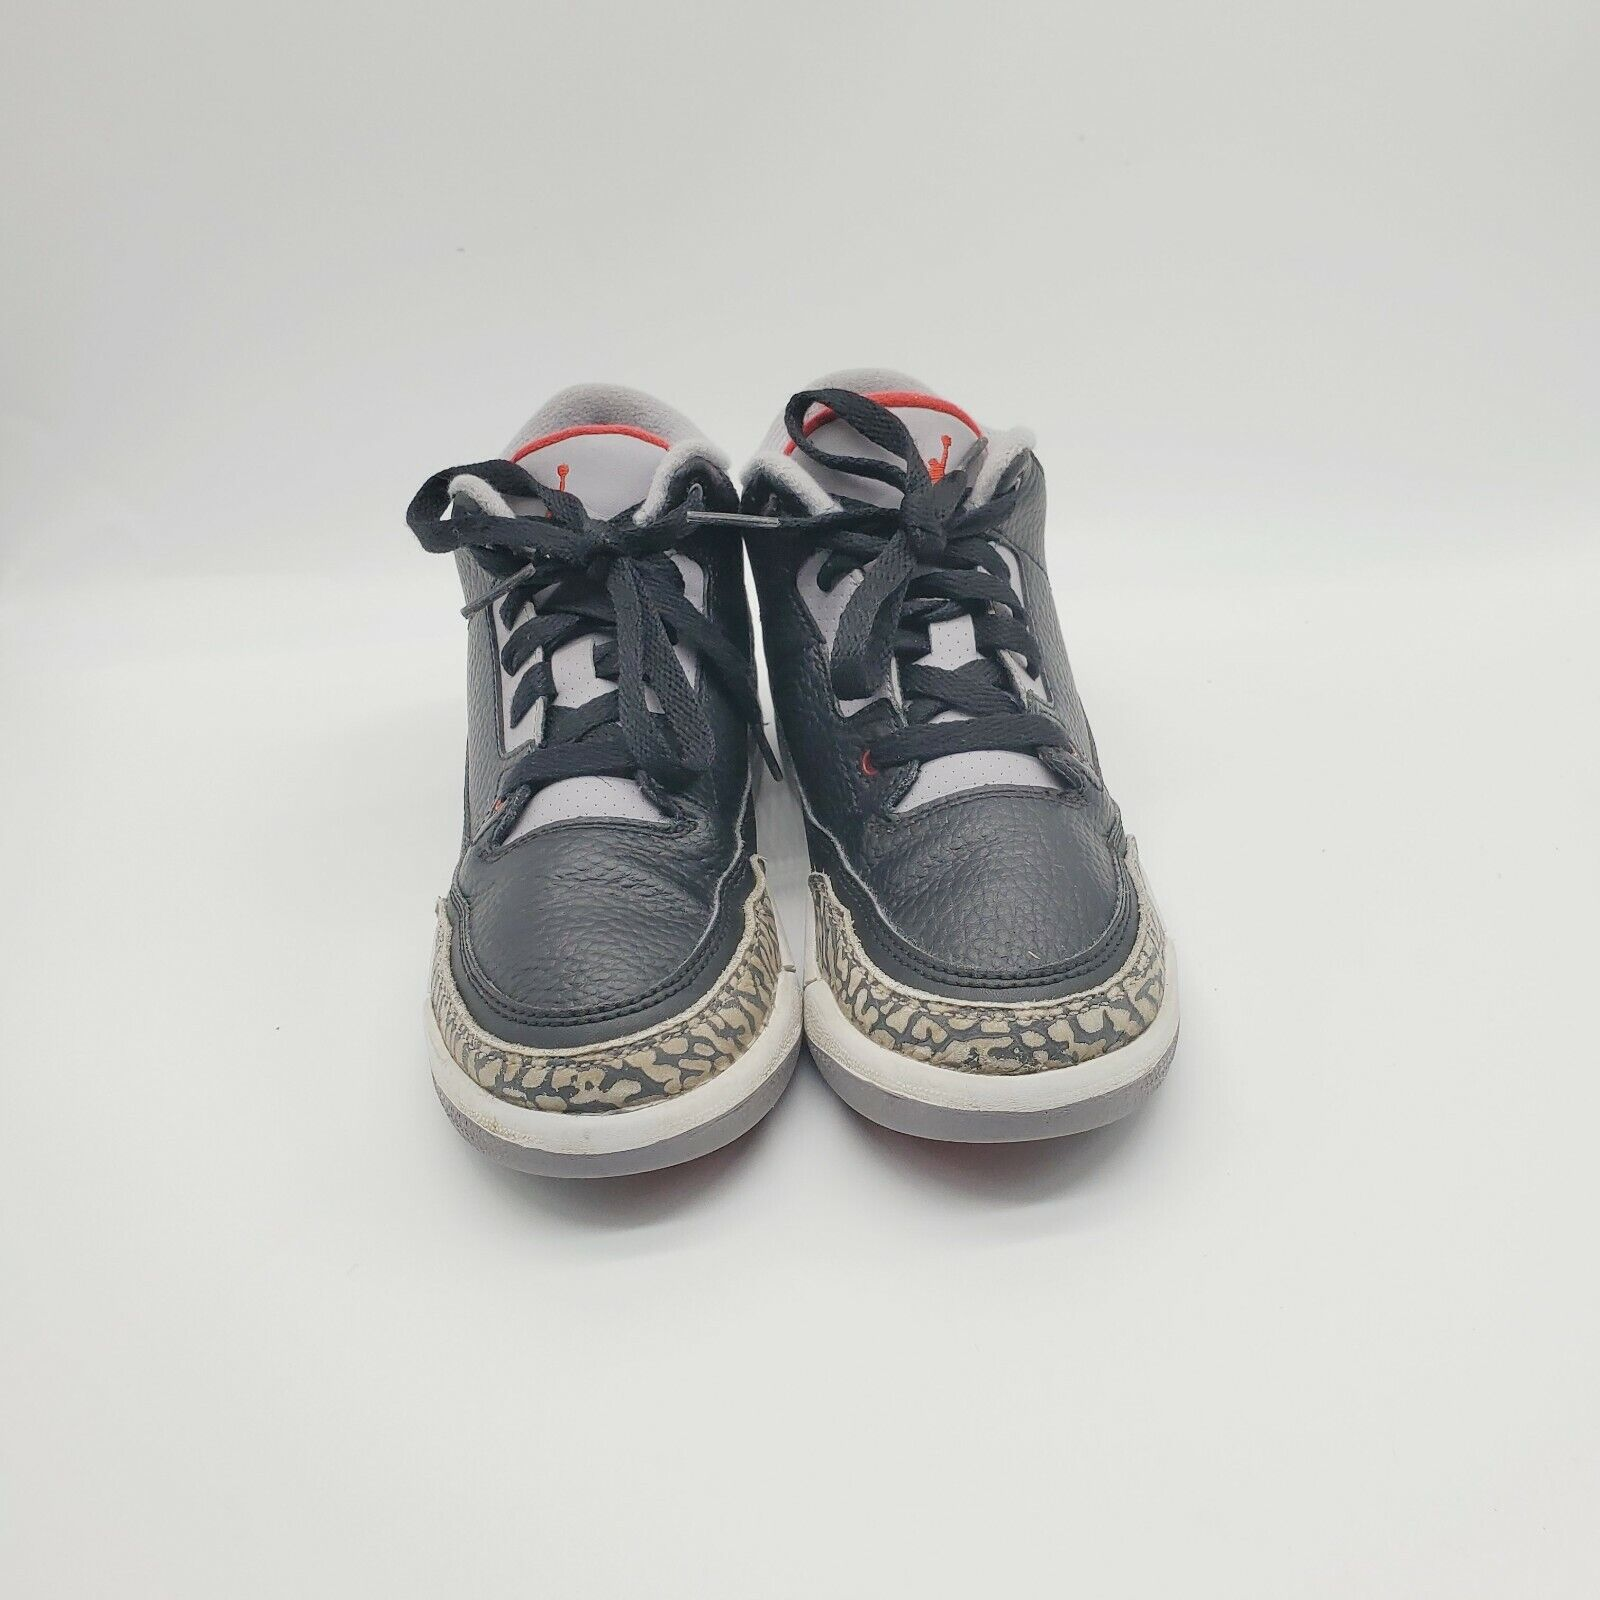 Nike Air Jordan Retro 3 Black Cement Kids Size 12c 429487-021 Boys Shoes